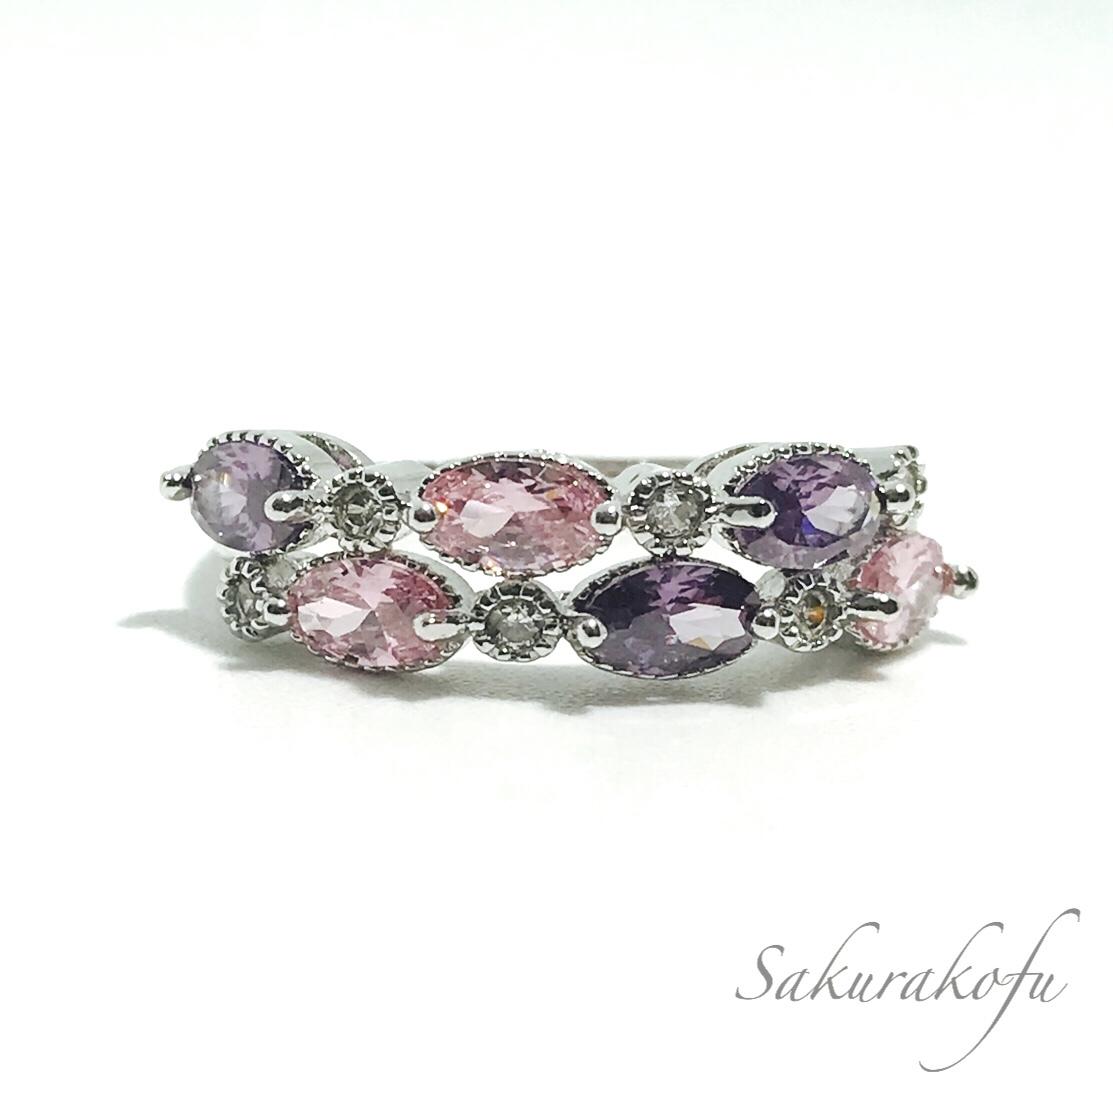 D001 送料無料 レディース 指輪 アクセサリー ピンク パープル Amethyst Pinksapphire Ring